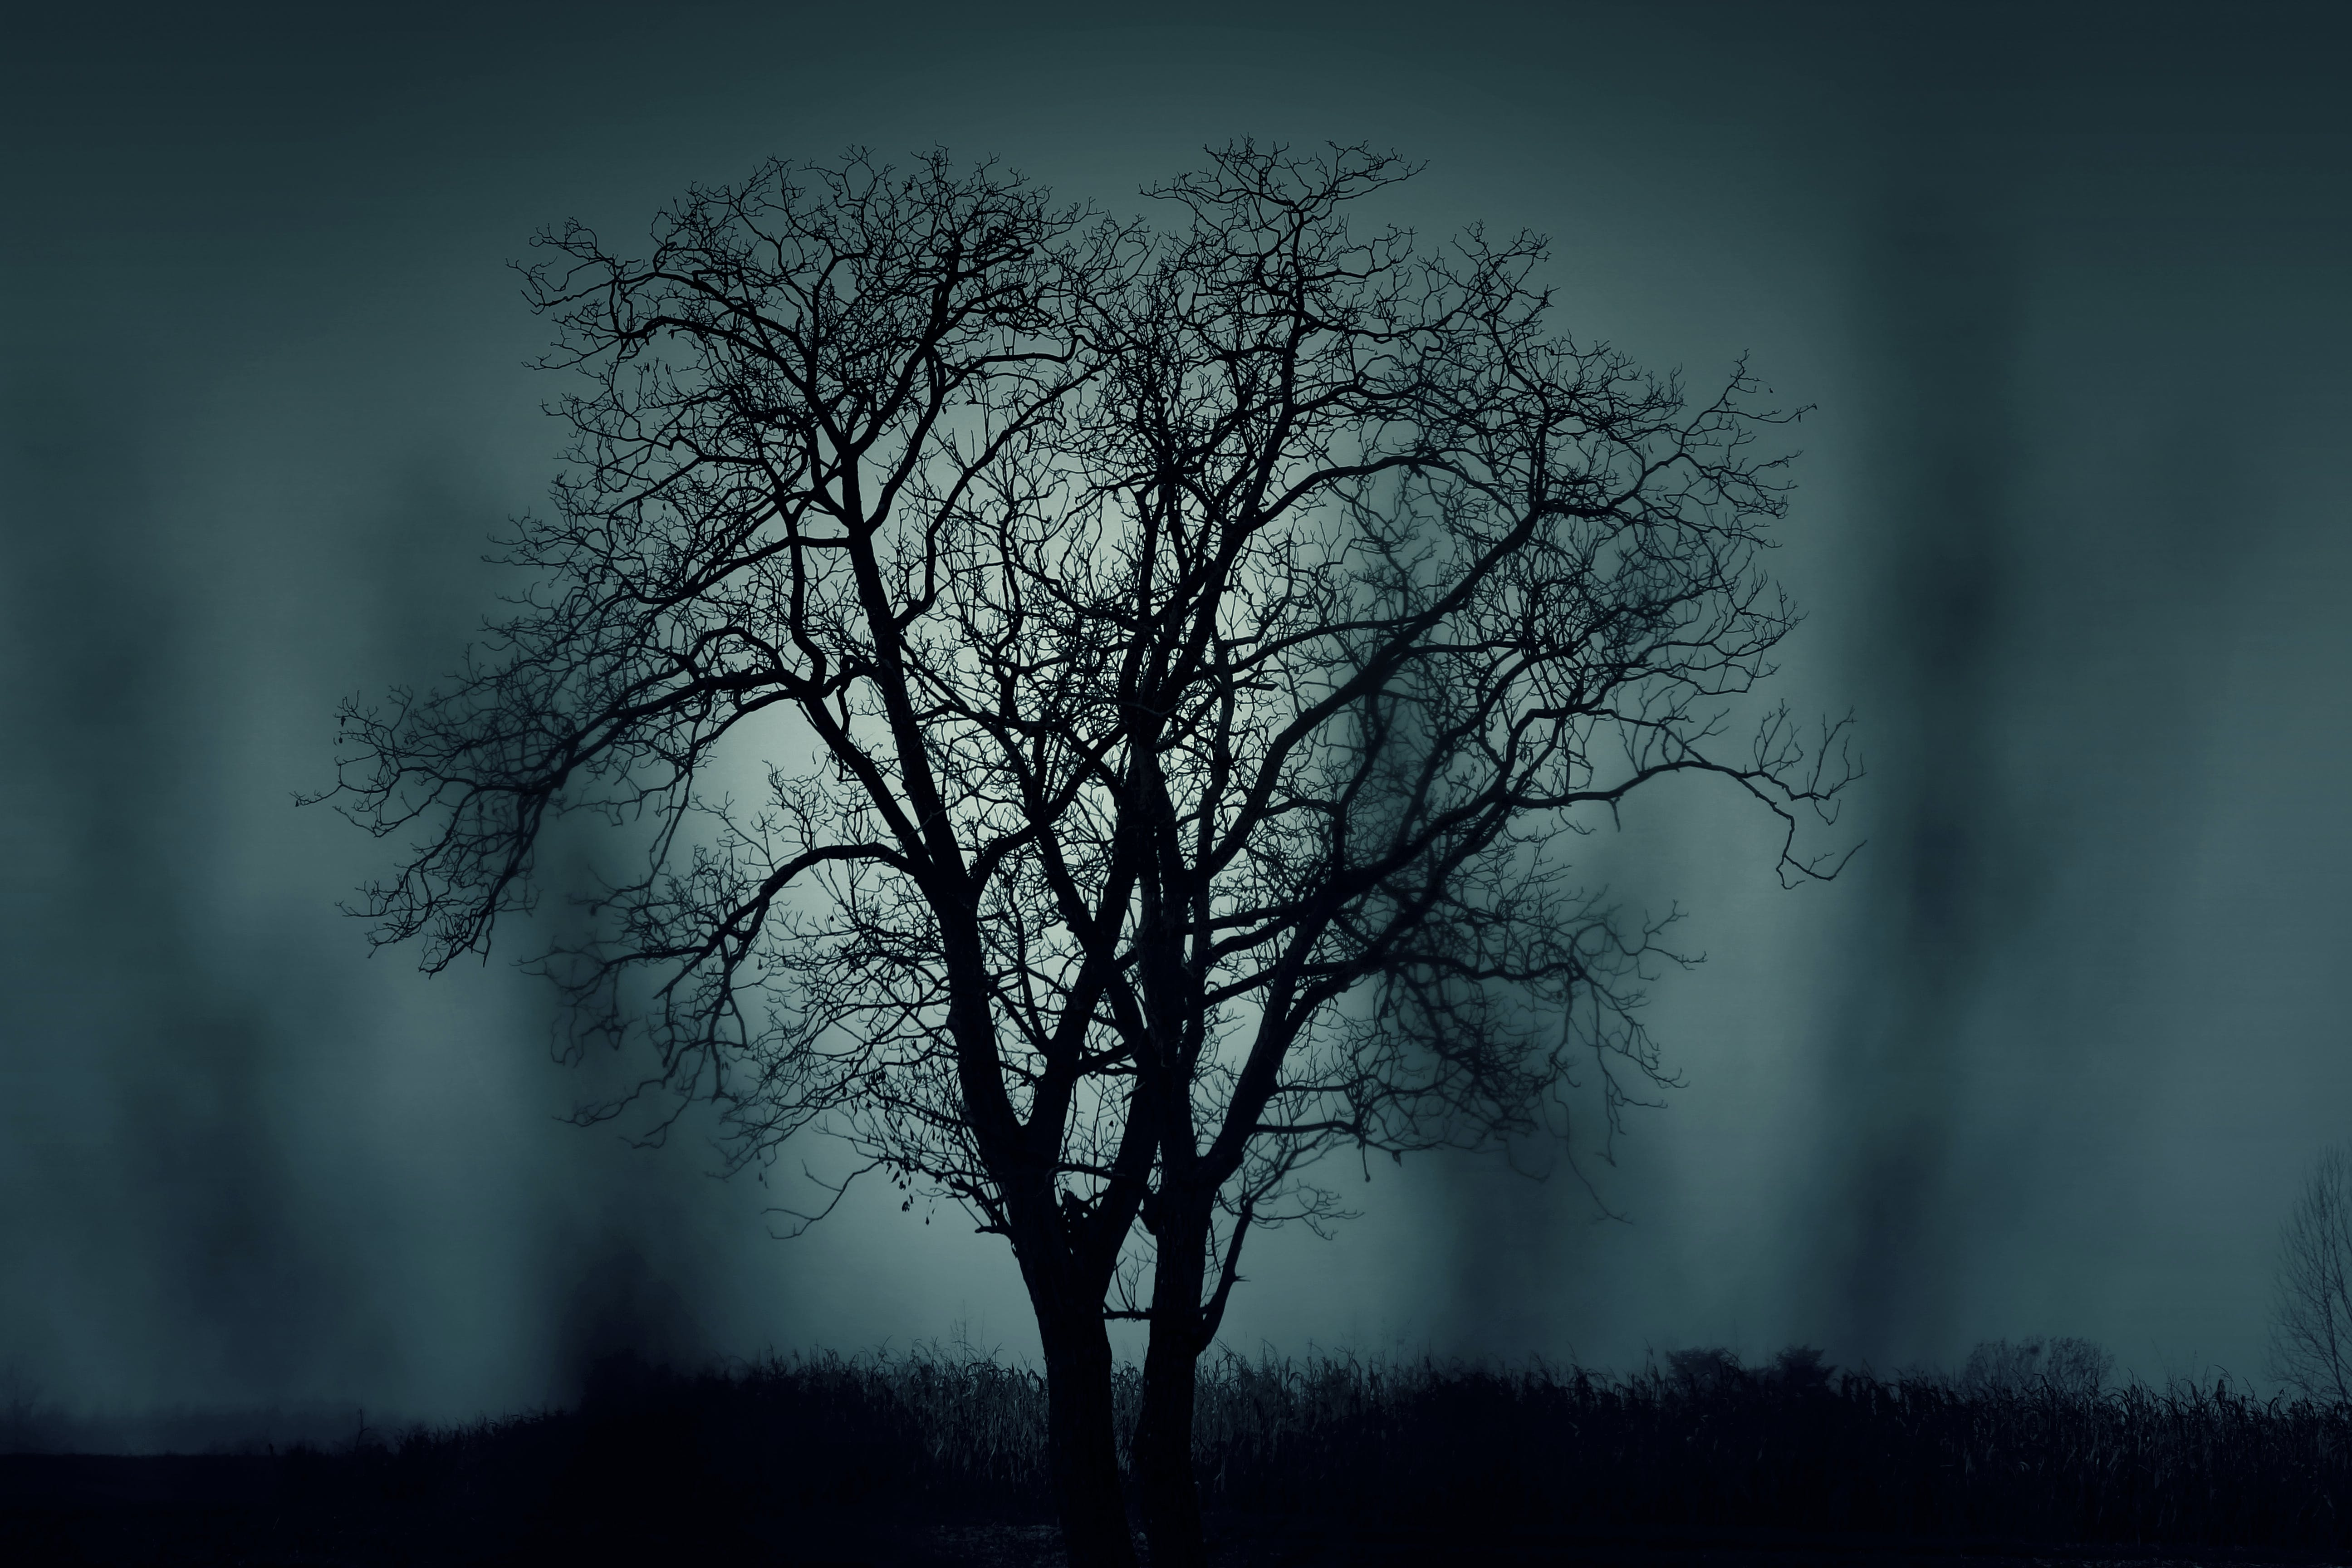 Black Tree at Night Time